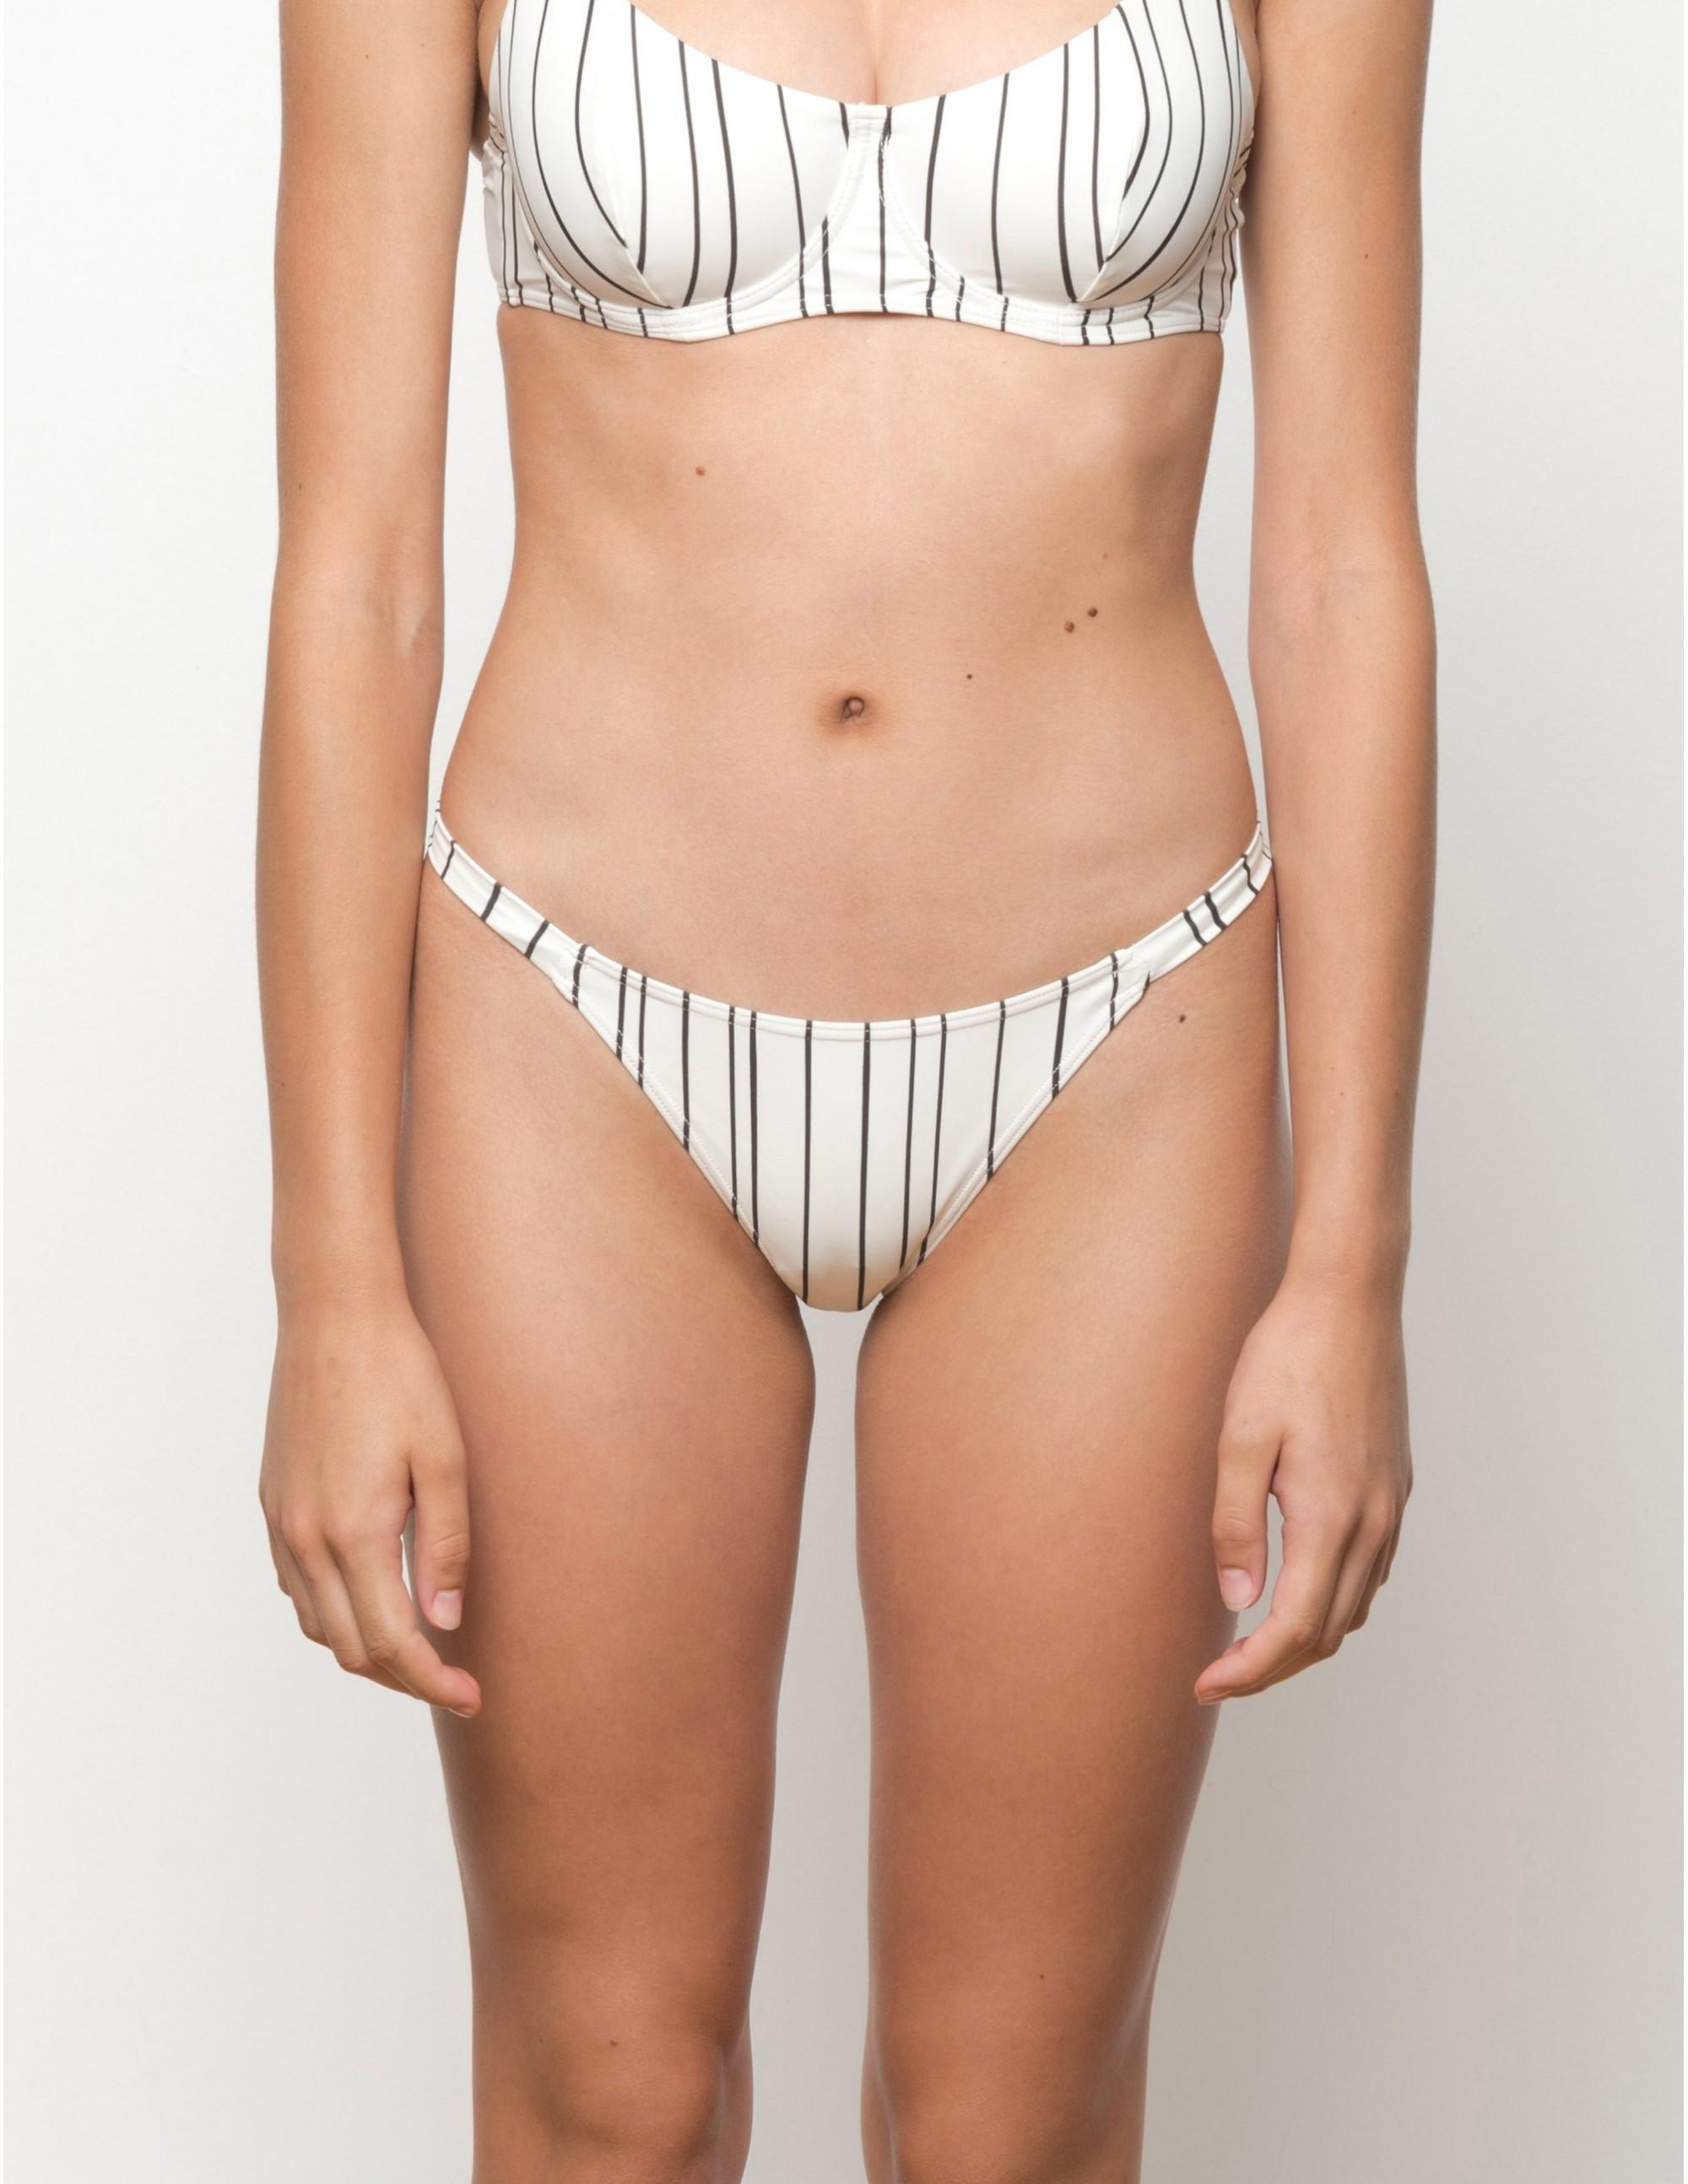 KIGO bikini bottom - LIMITLESS